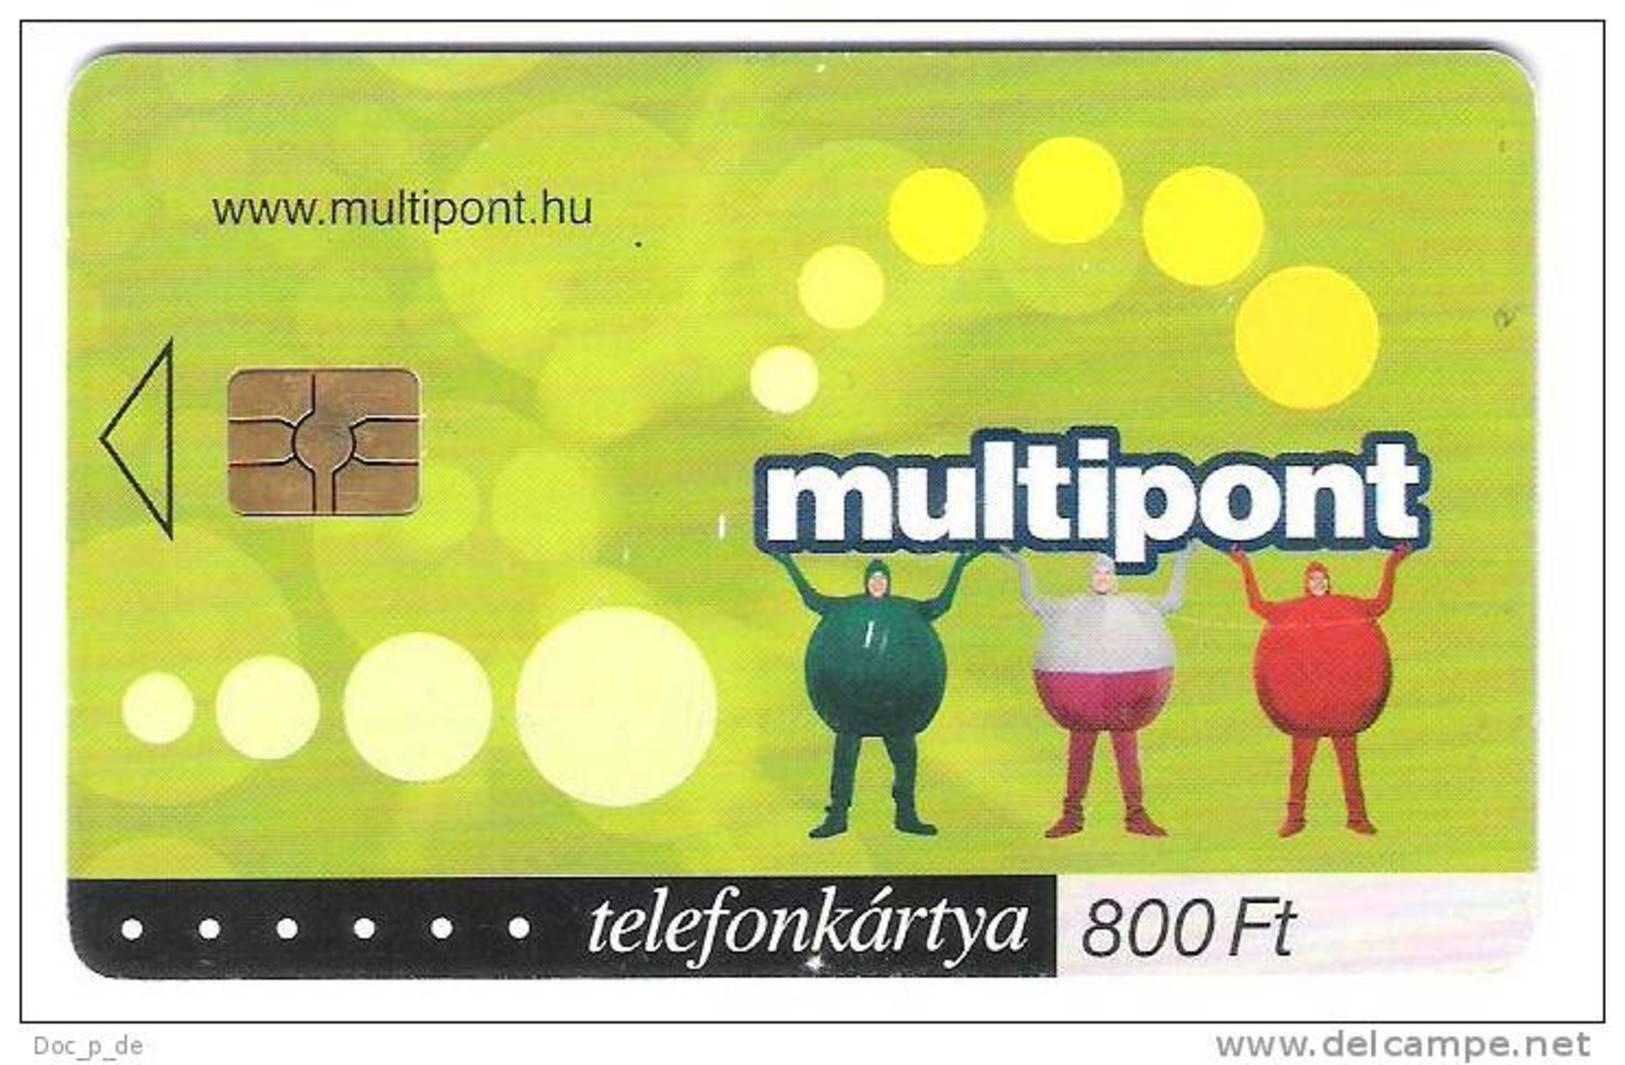 Ungarn - Hungary - Multipont 800 Ft - 11/2002 - 30.000 Ex. - Hungary